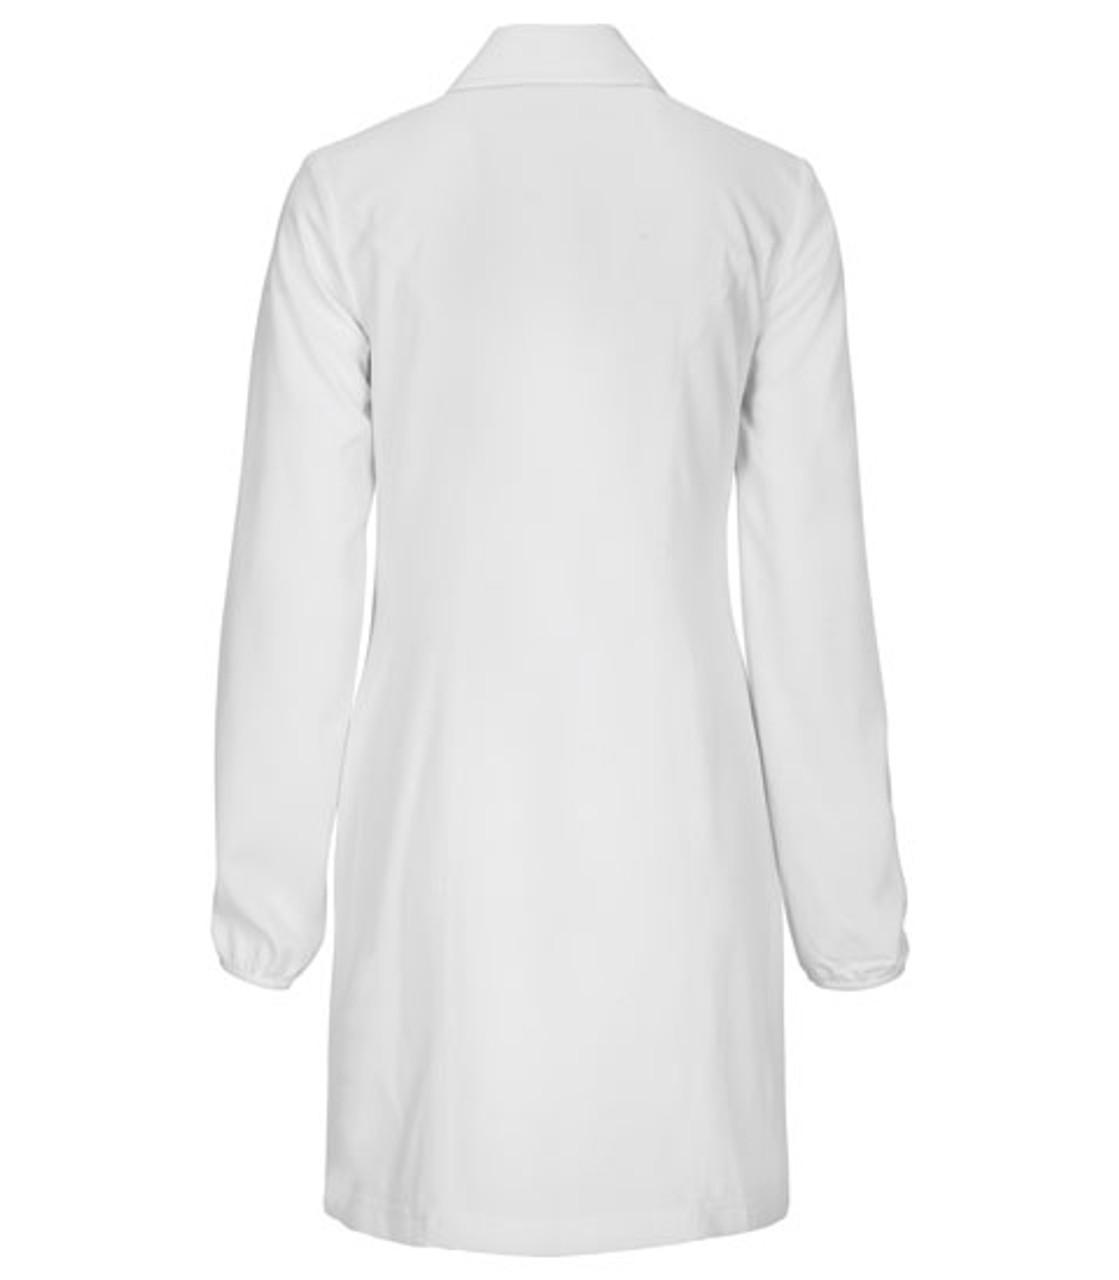 20402 Lab coat - Back View